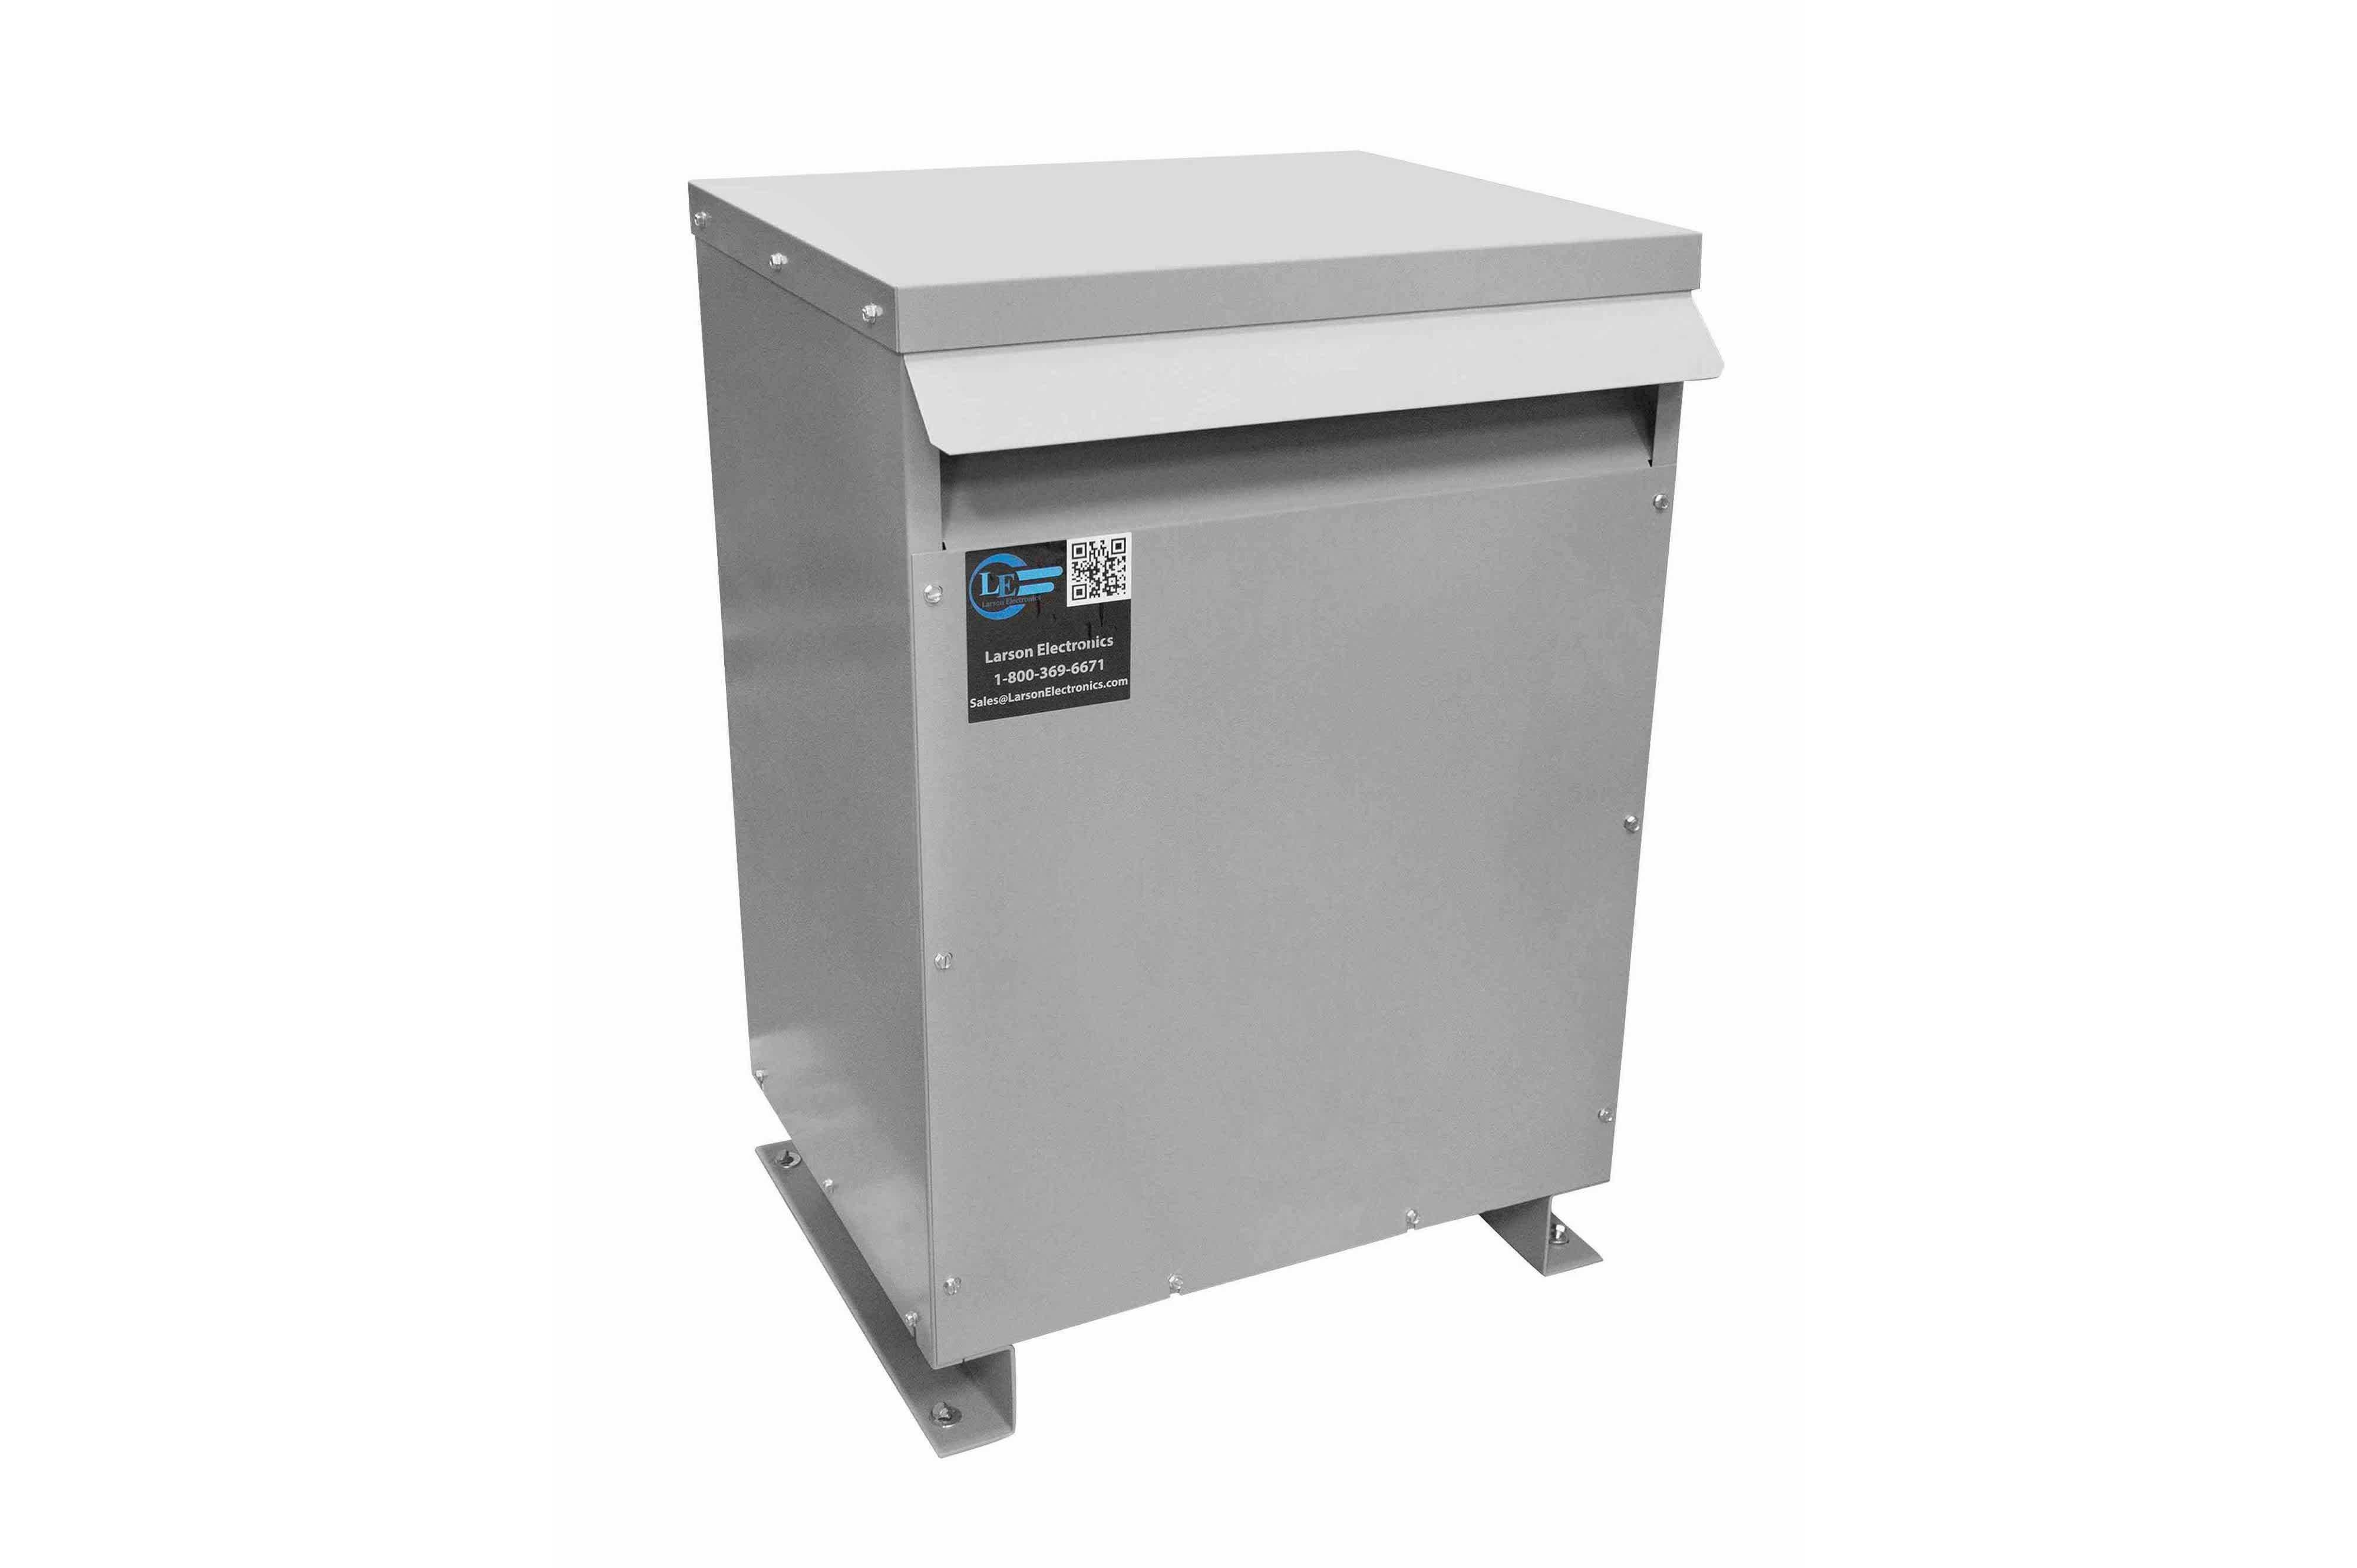 175 kVA 3PH Isolation Transformer, 440V Wye Primary, 208V Delta Secondary, N3R, Ventilated, 60 Hz